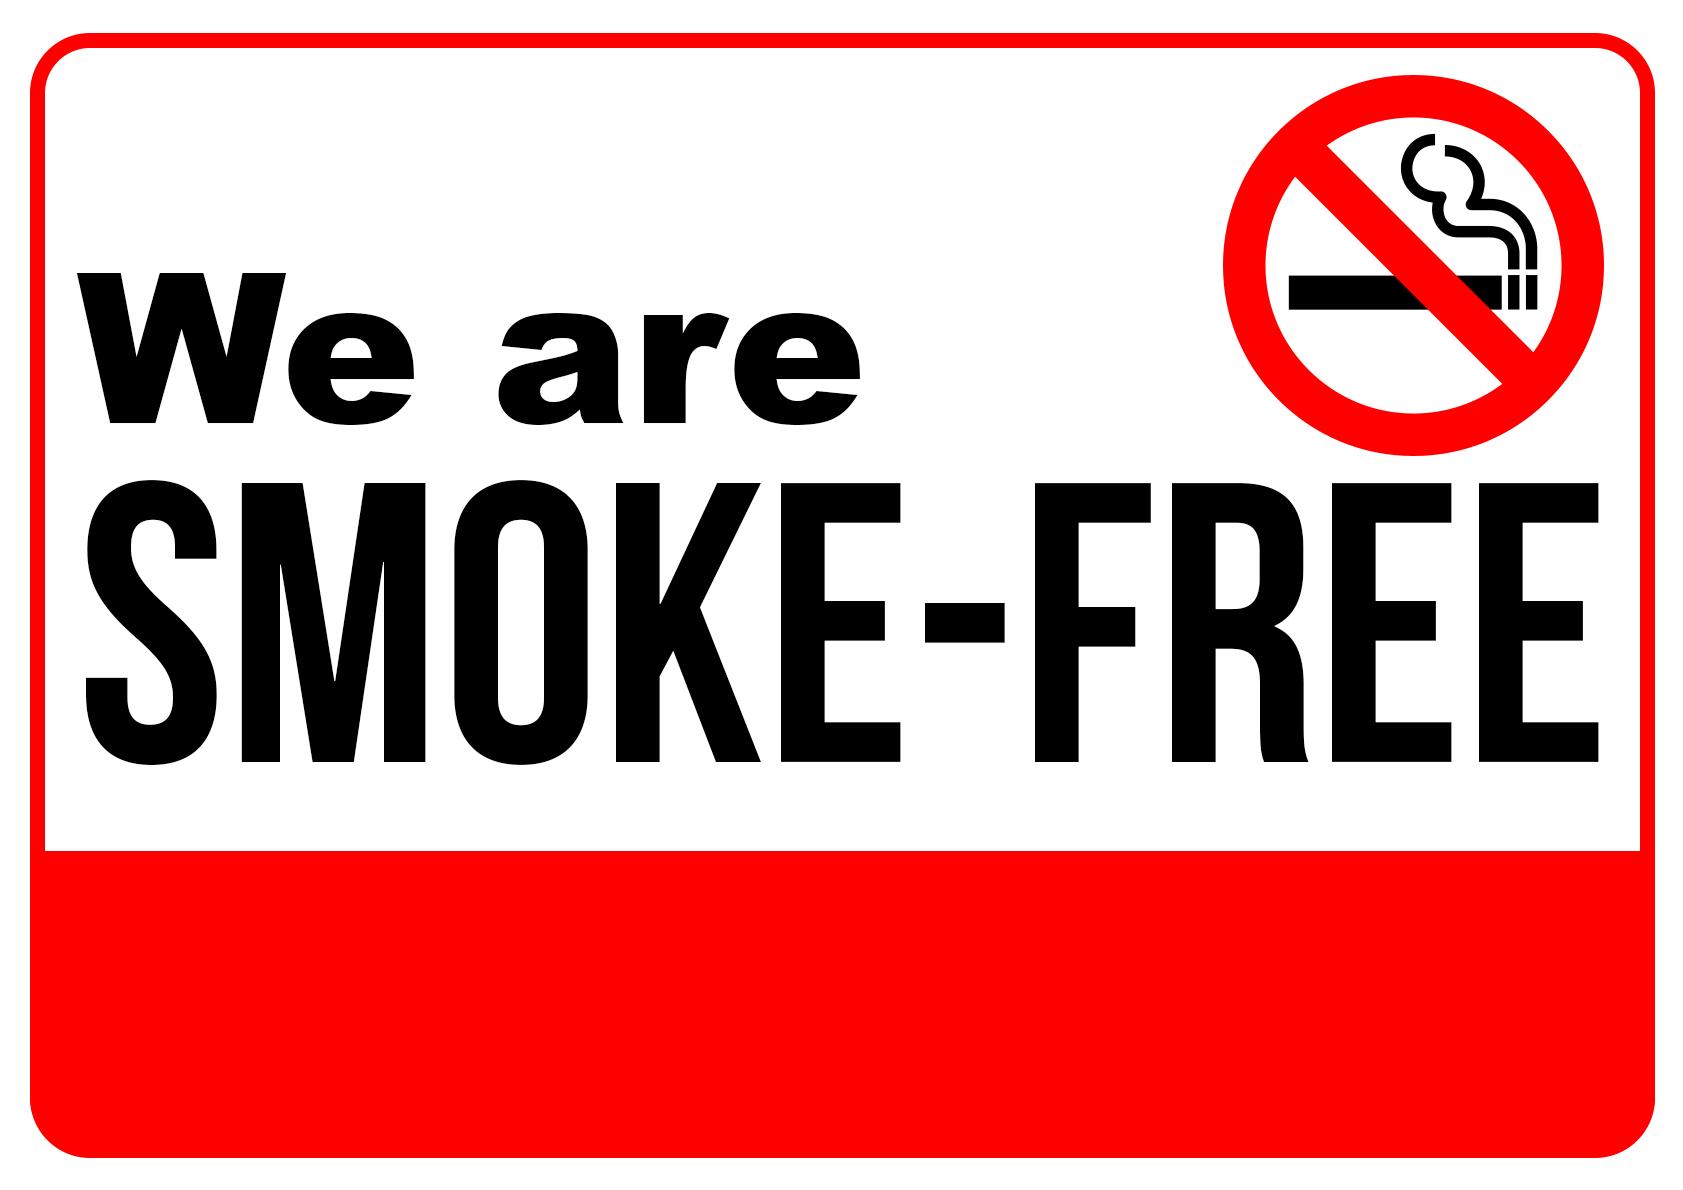 We Are Smoke free